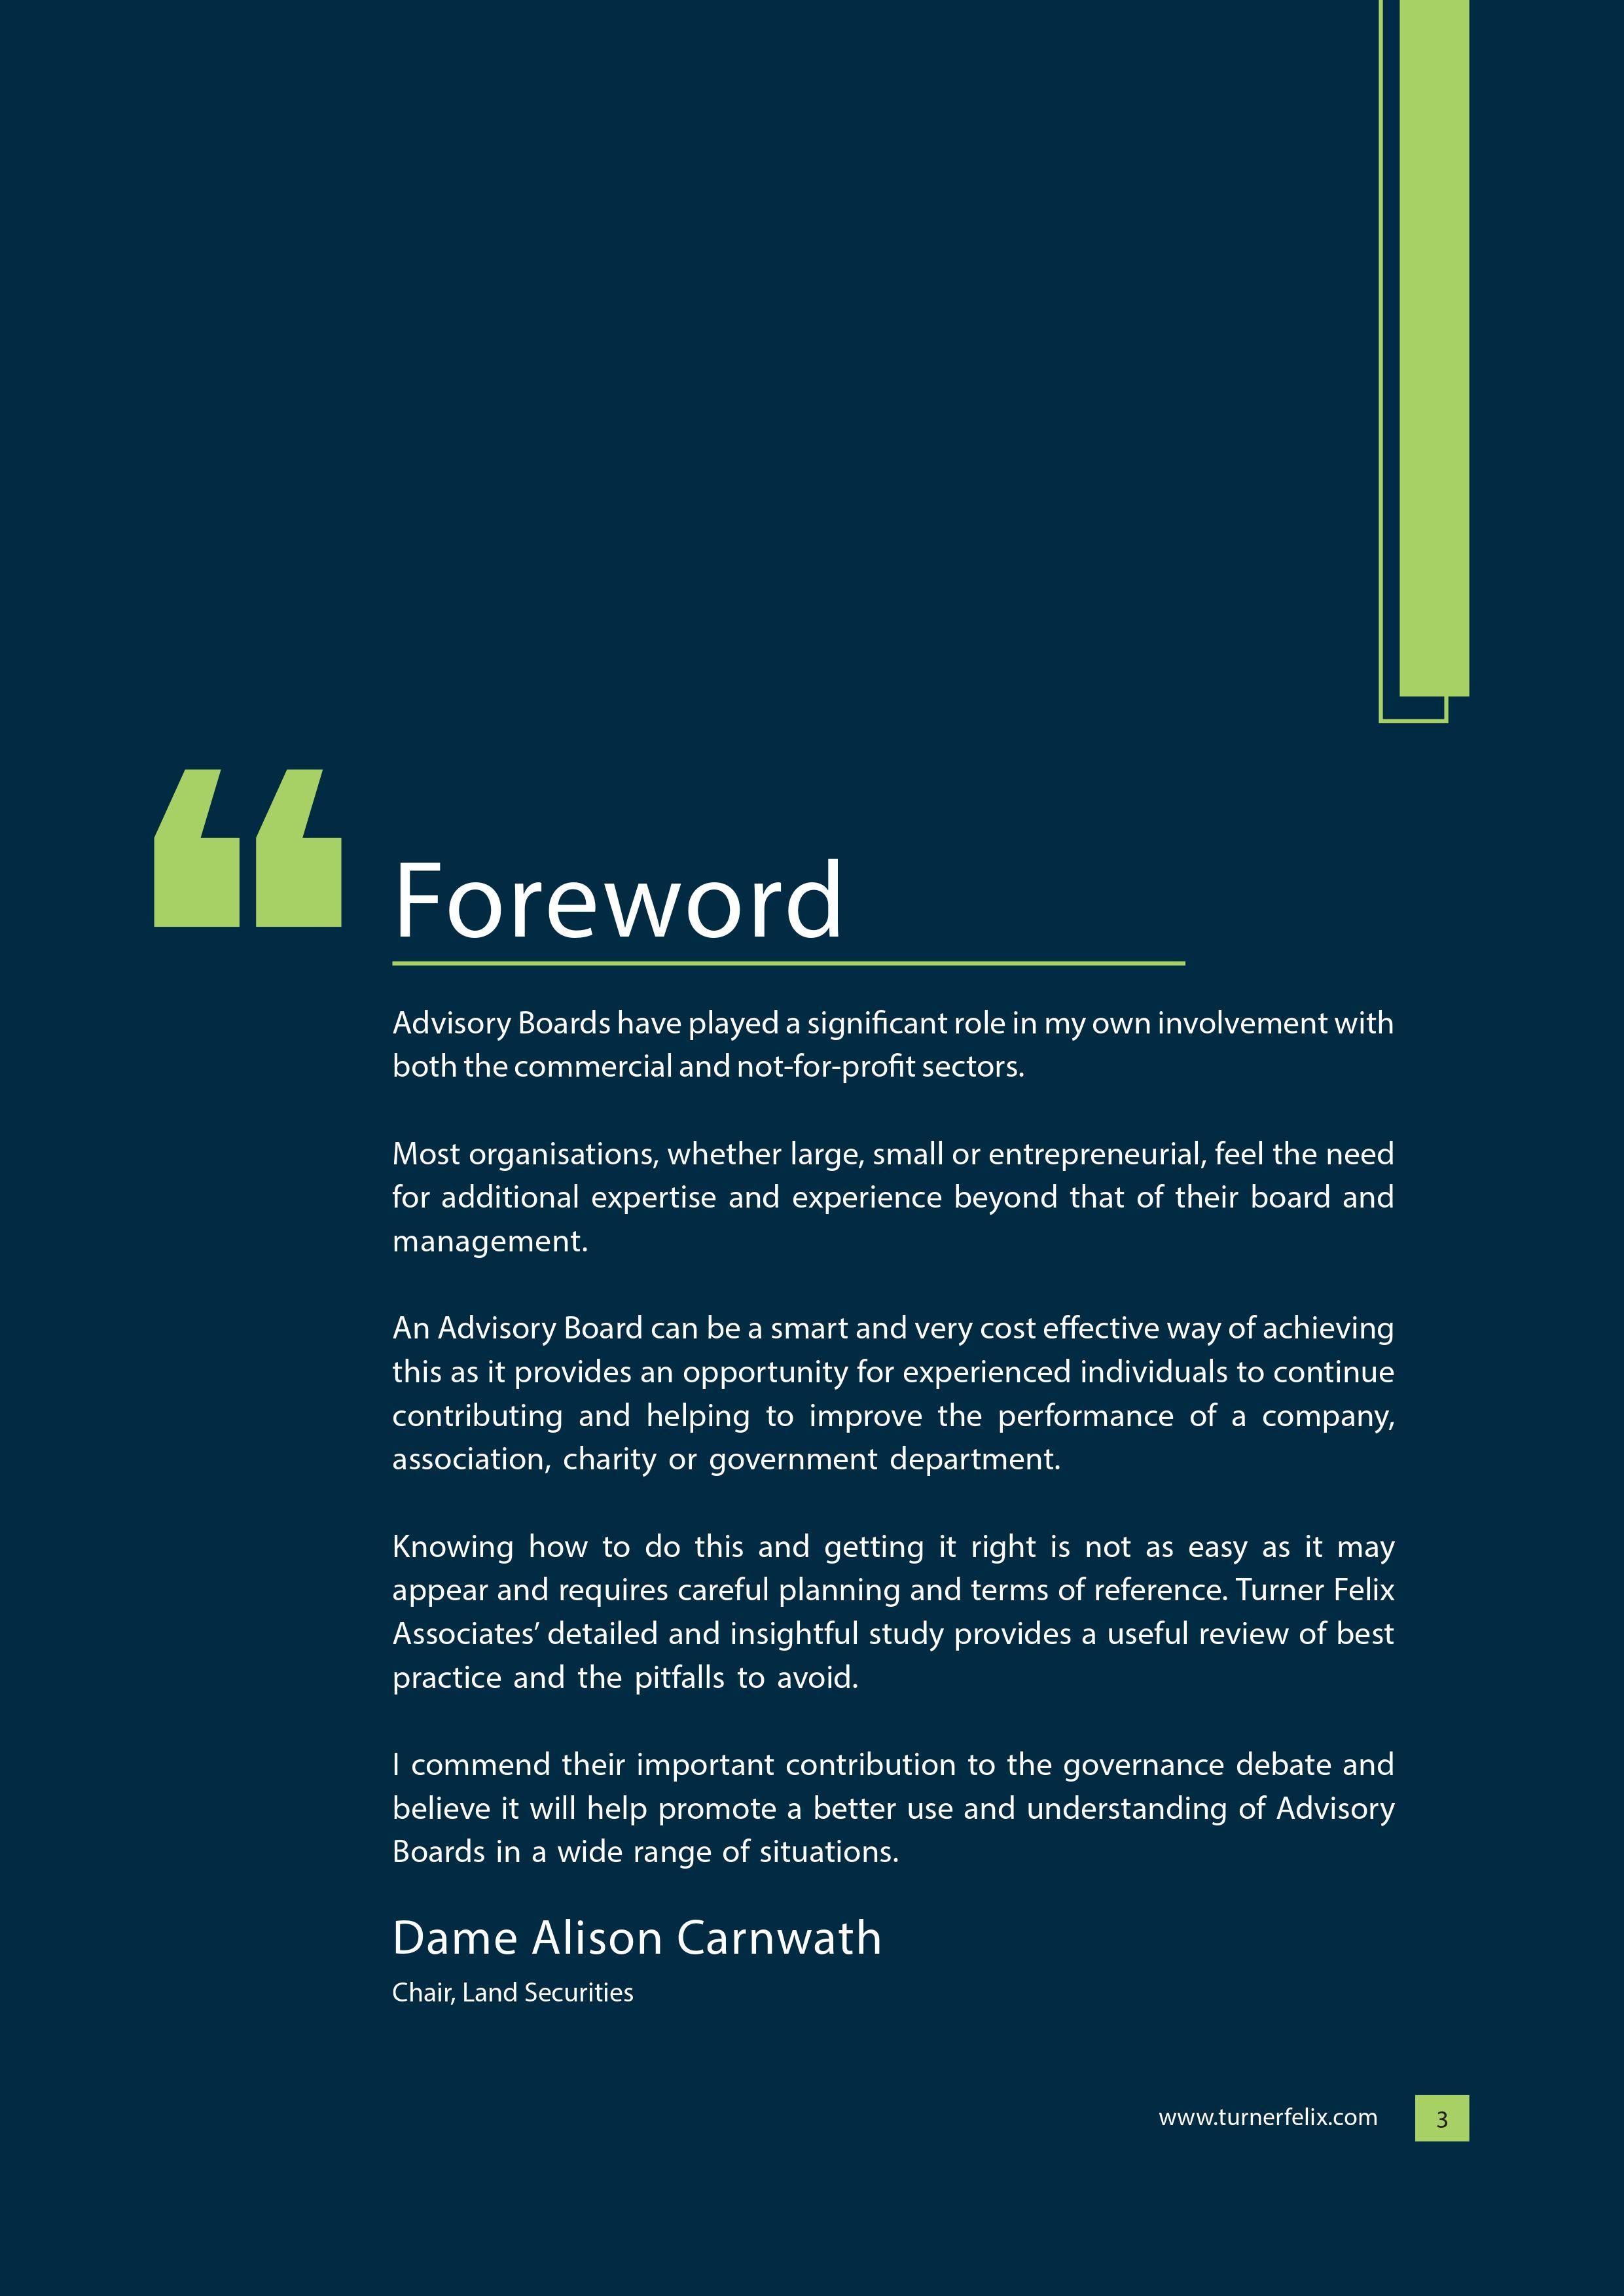 Foreward.jpg